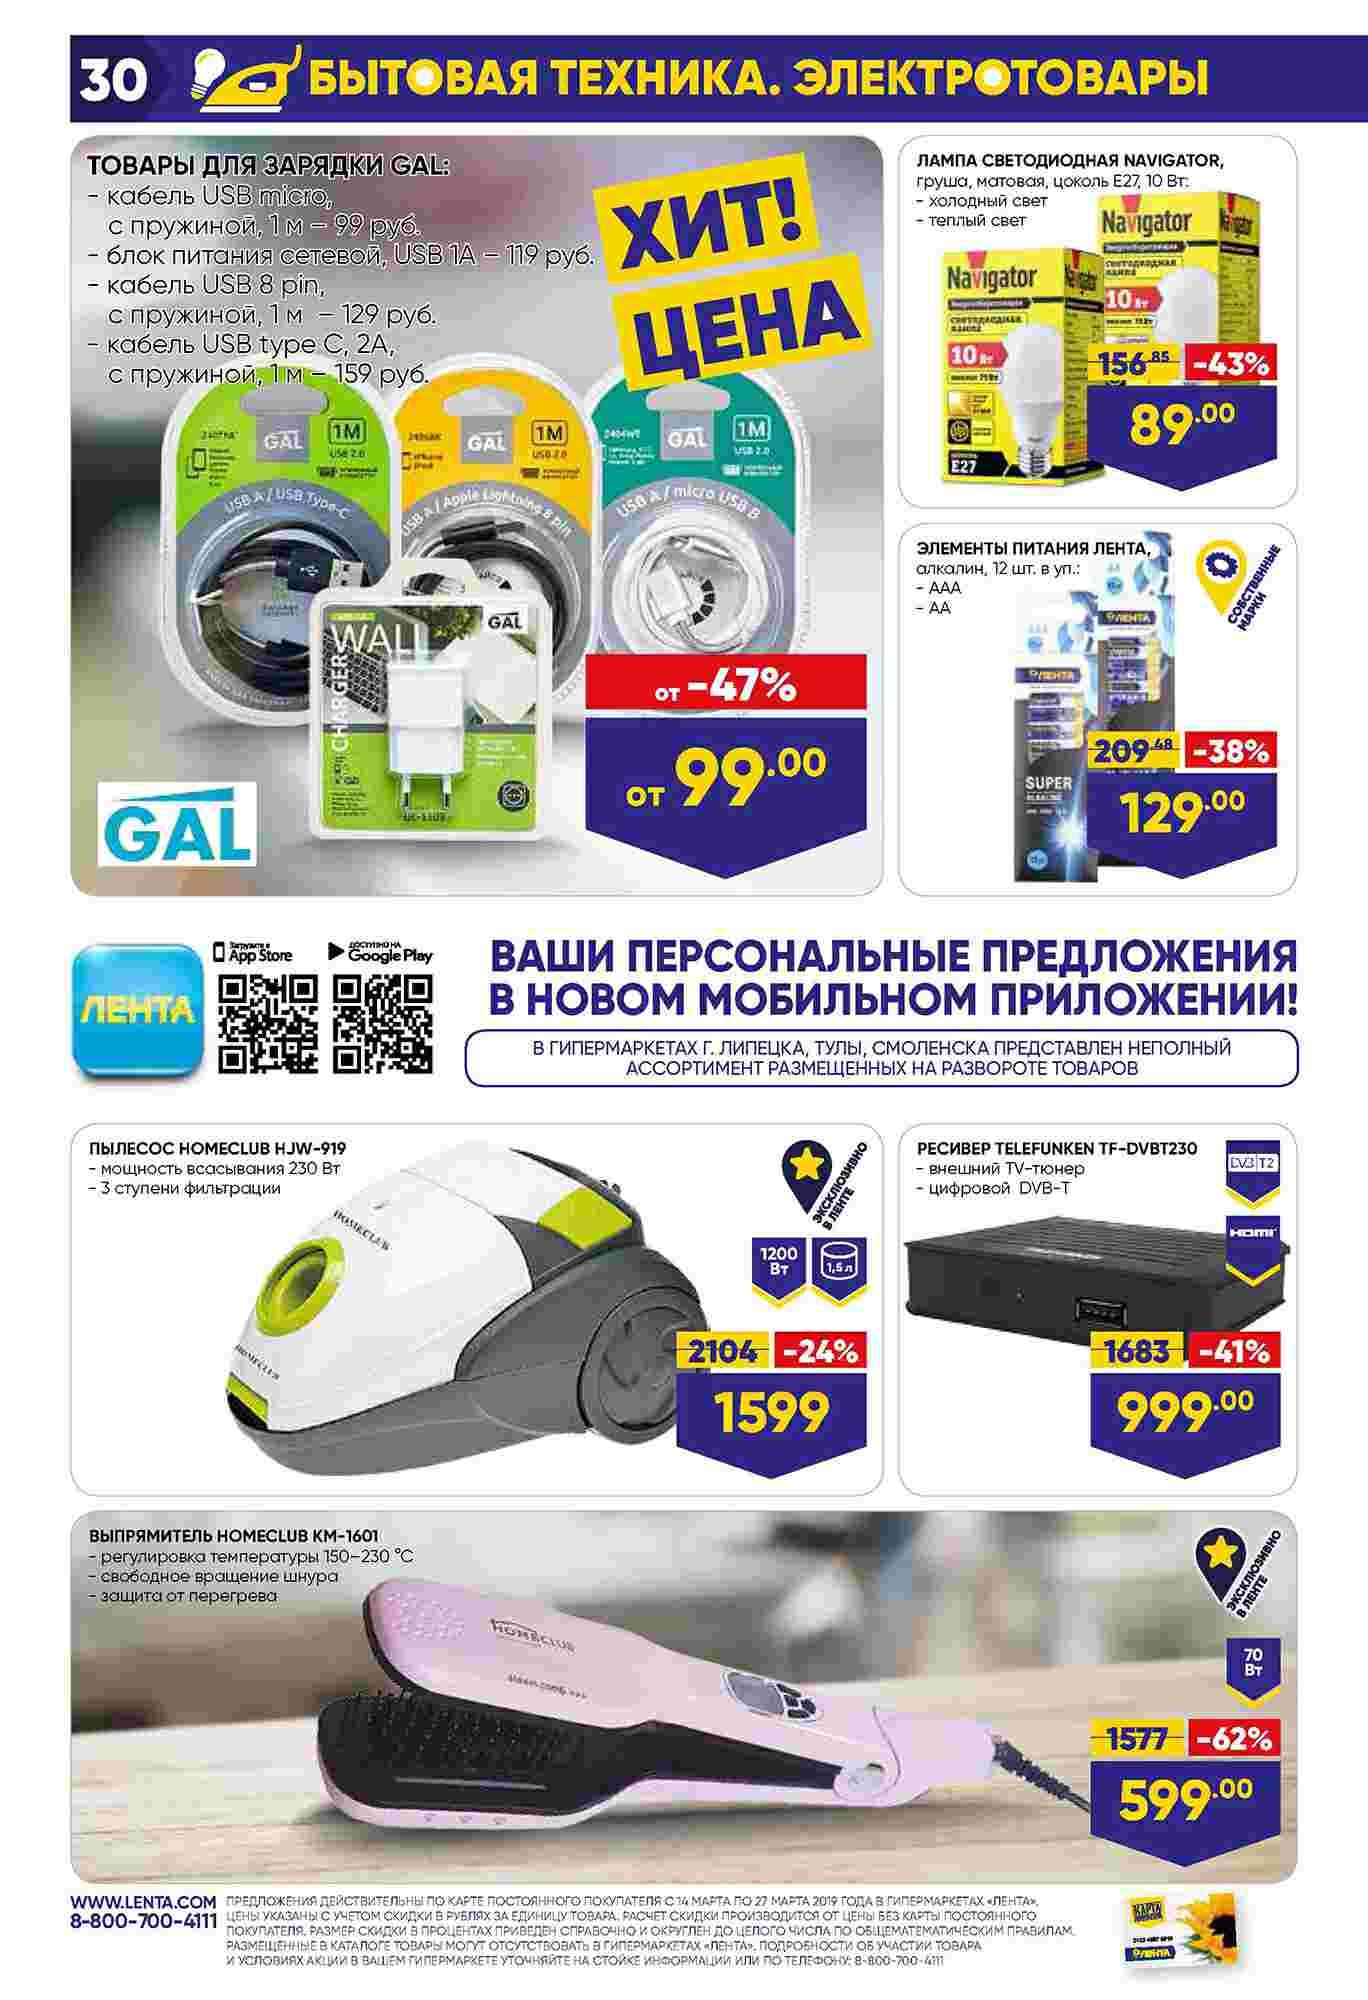 Каталог Лента гипермаркет 14-27.03.2019 стр. - 0001 - 0030